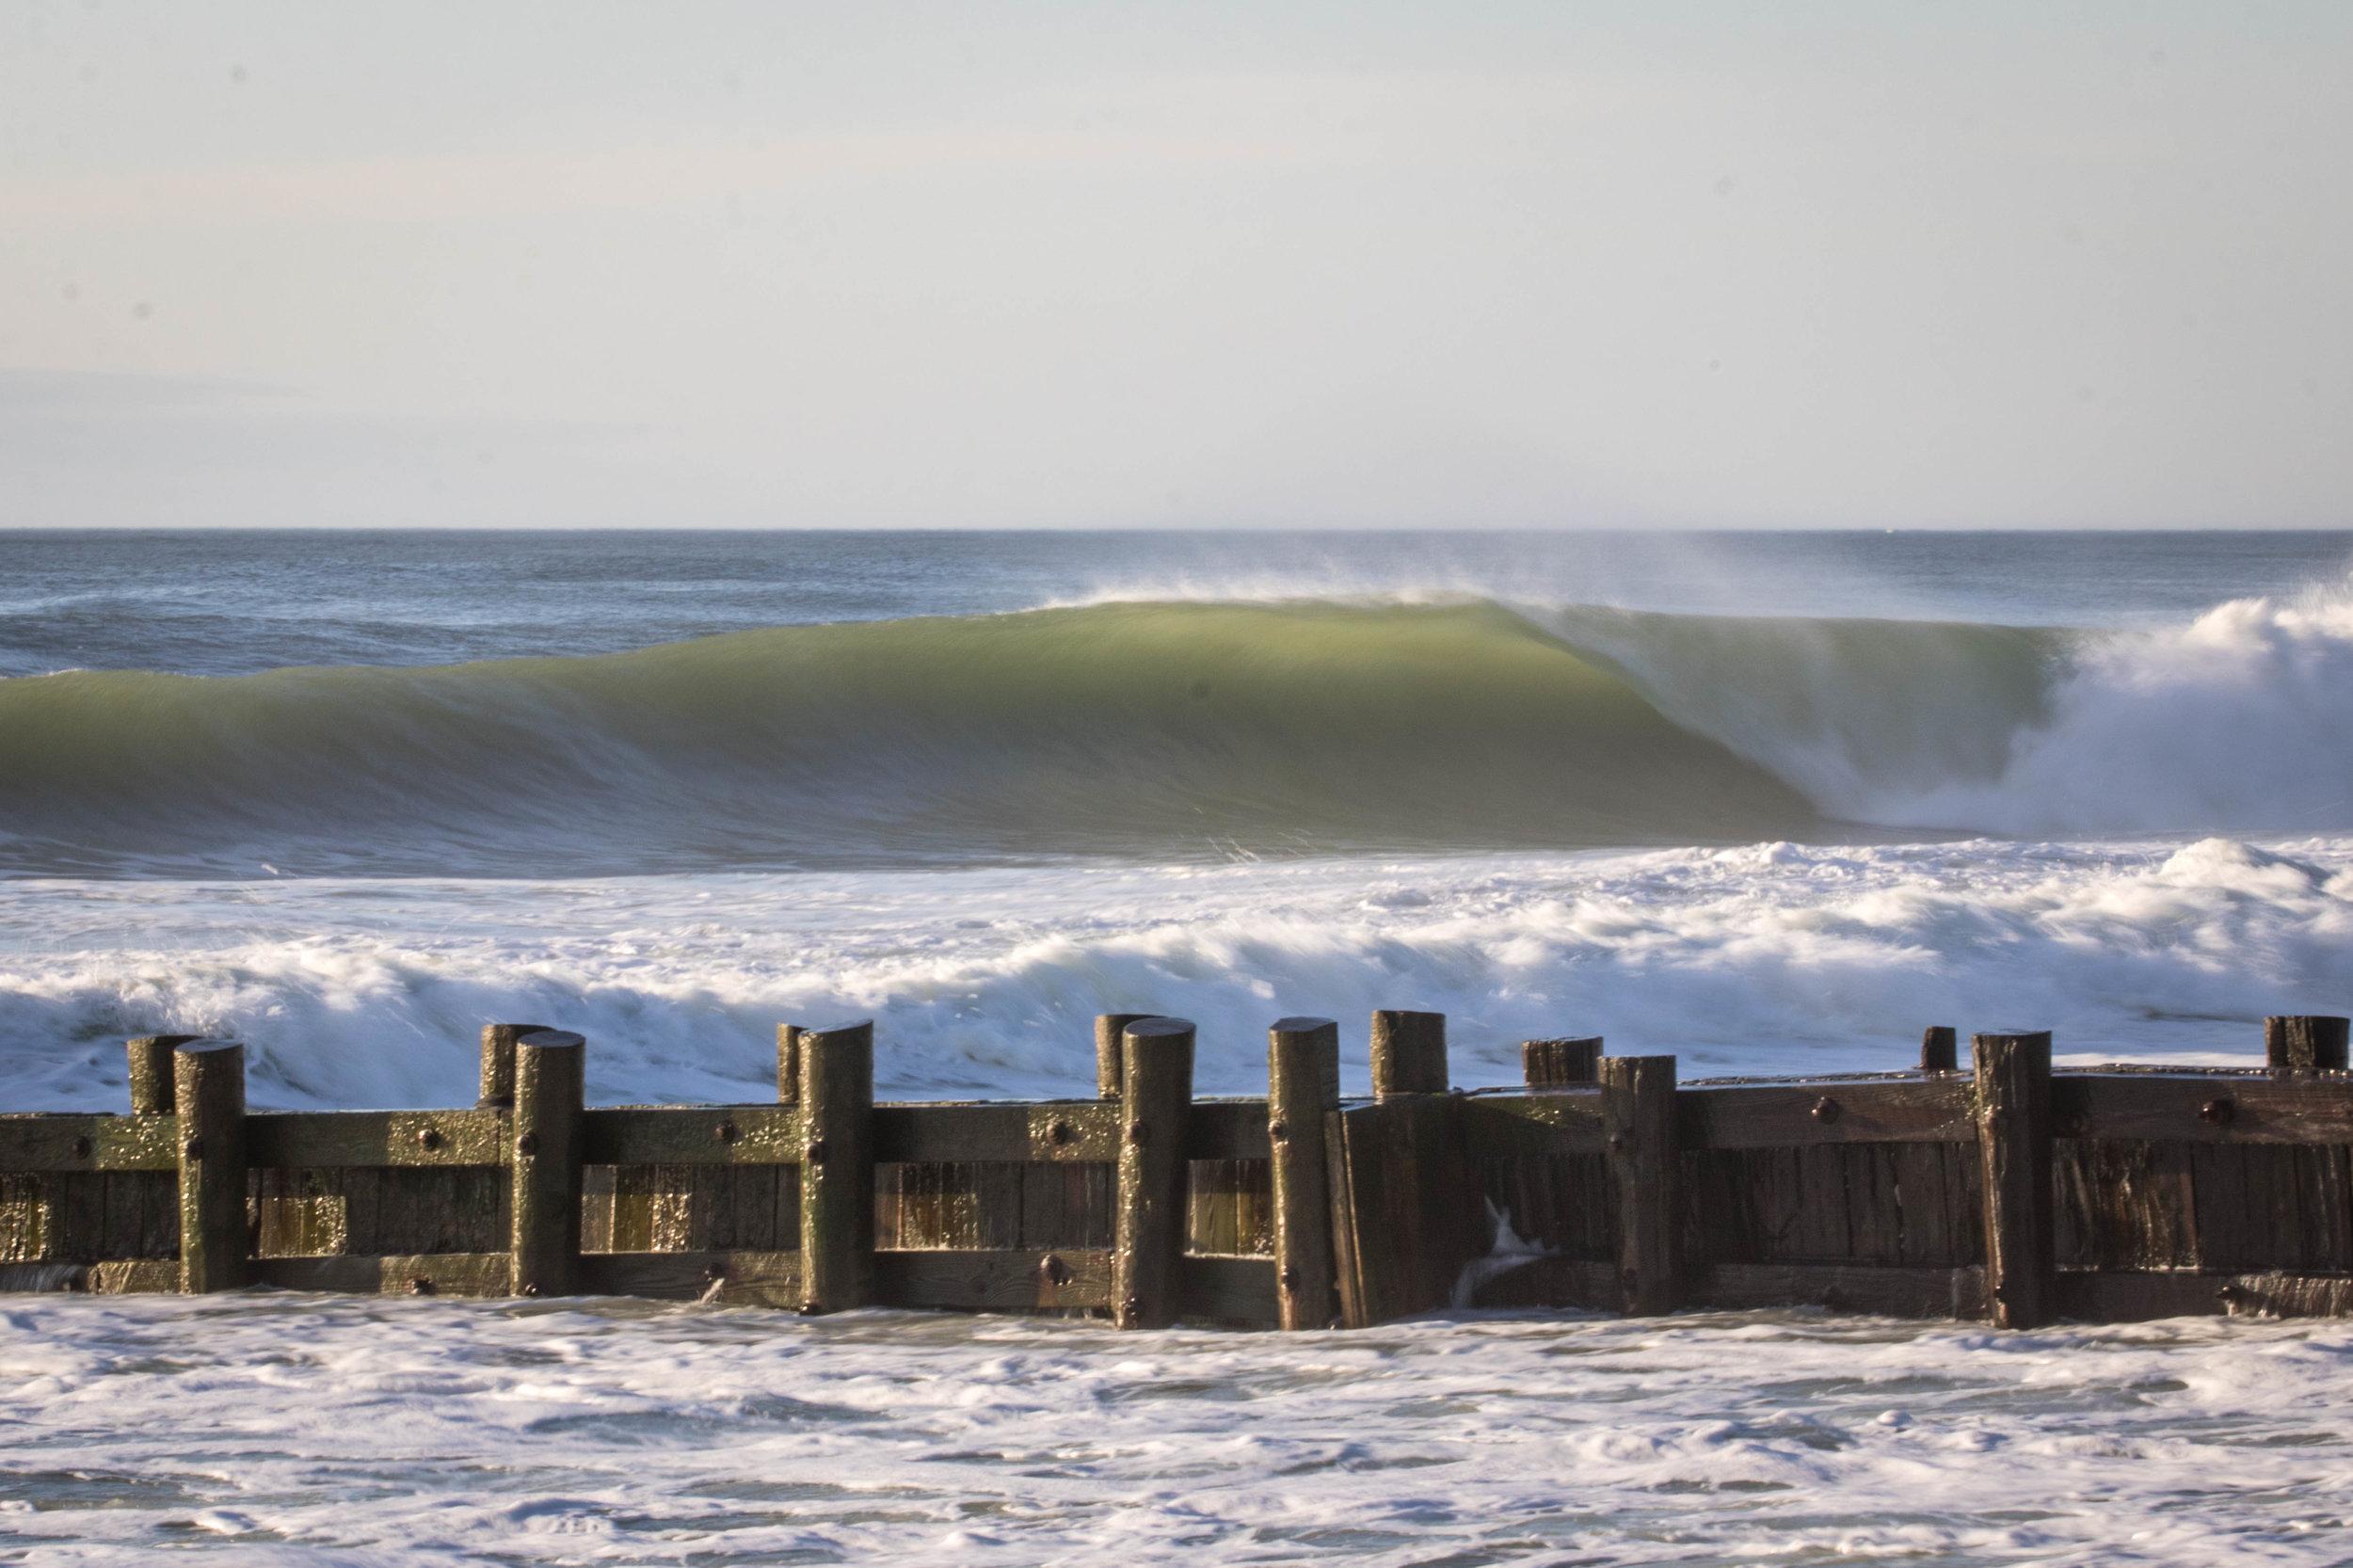 4-26-18 Bayhead Wave 18.jpg